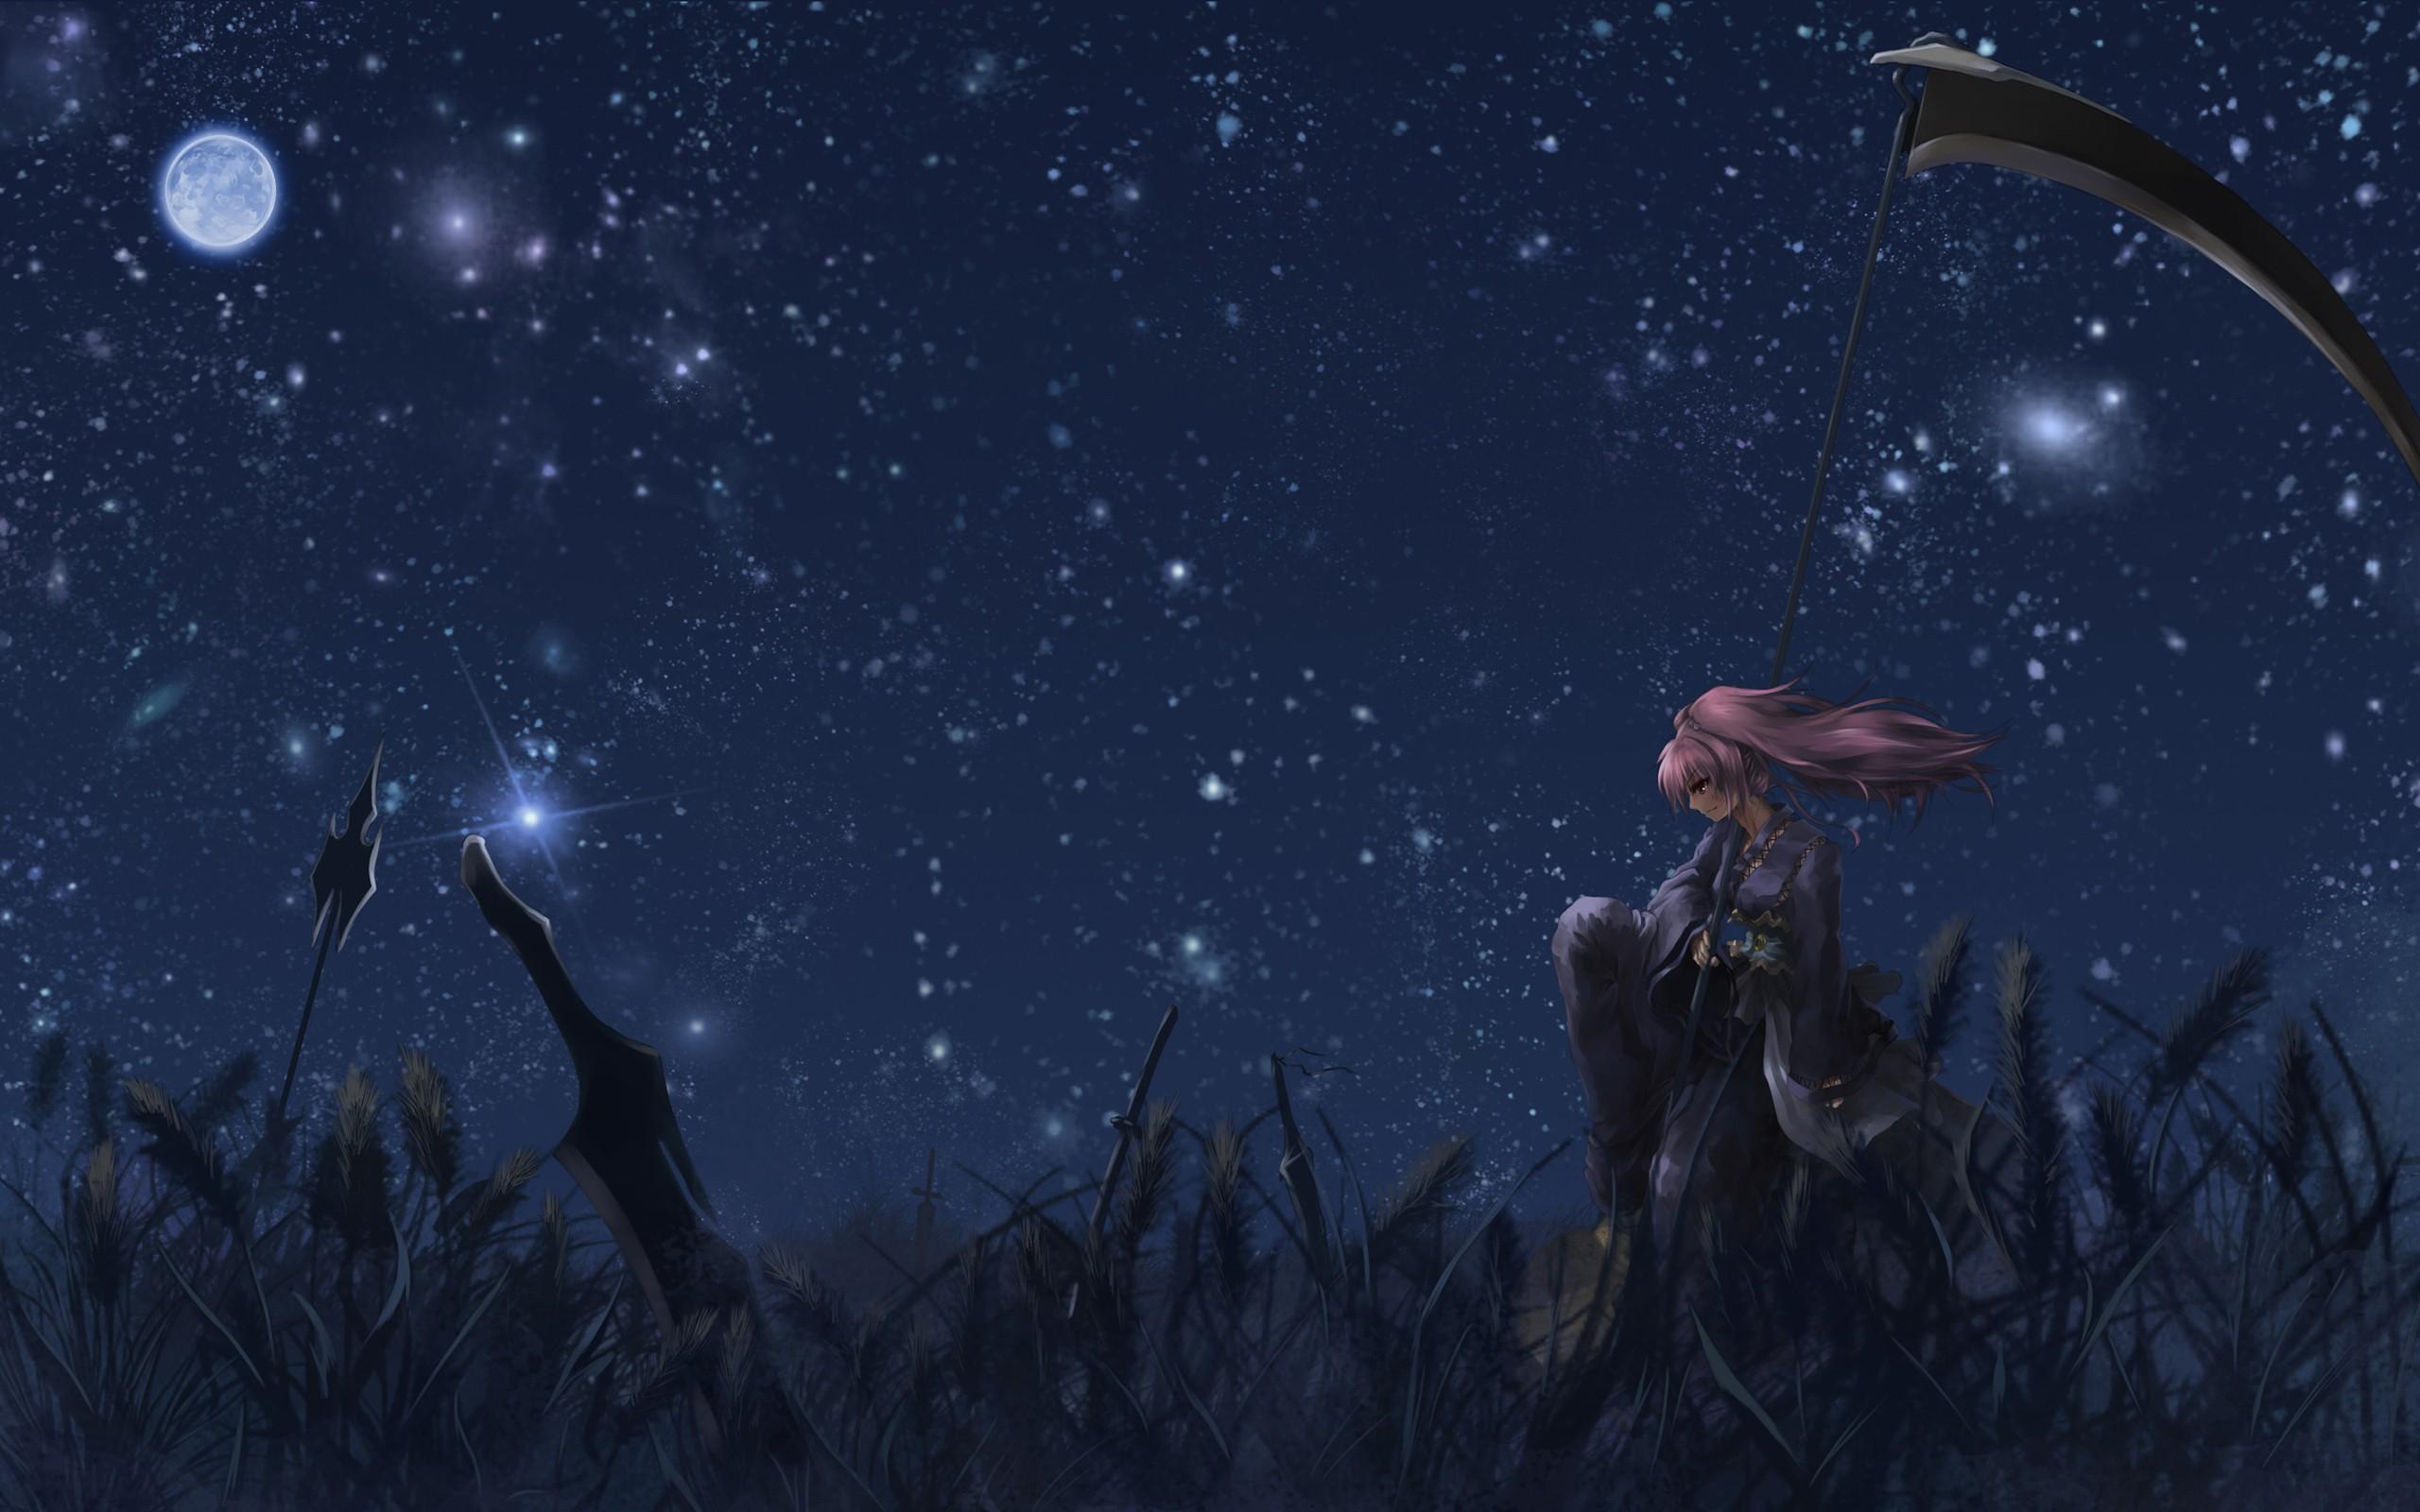 Wallpaper Anime Girl 2560x1600 Lilyth Scarlethcano 1275973